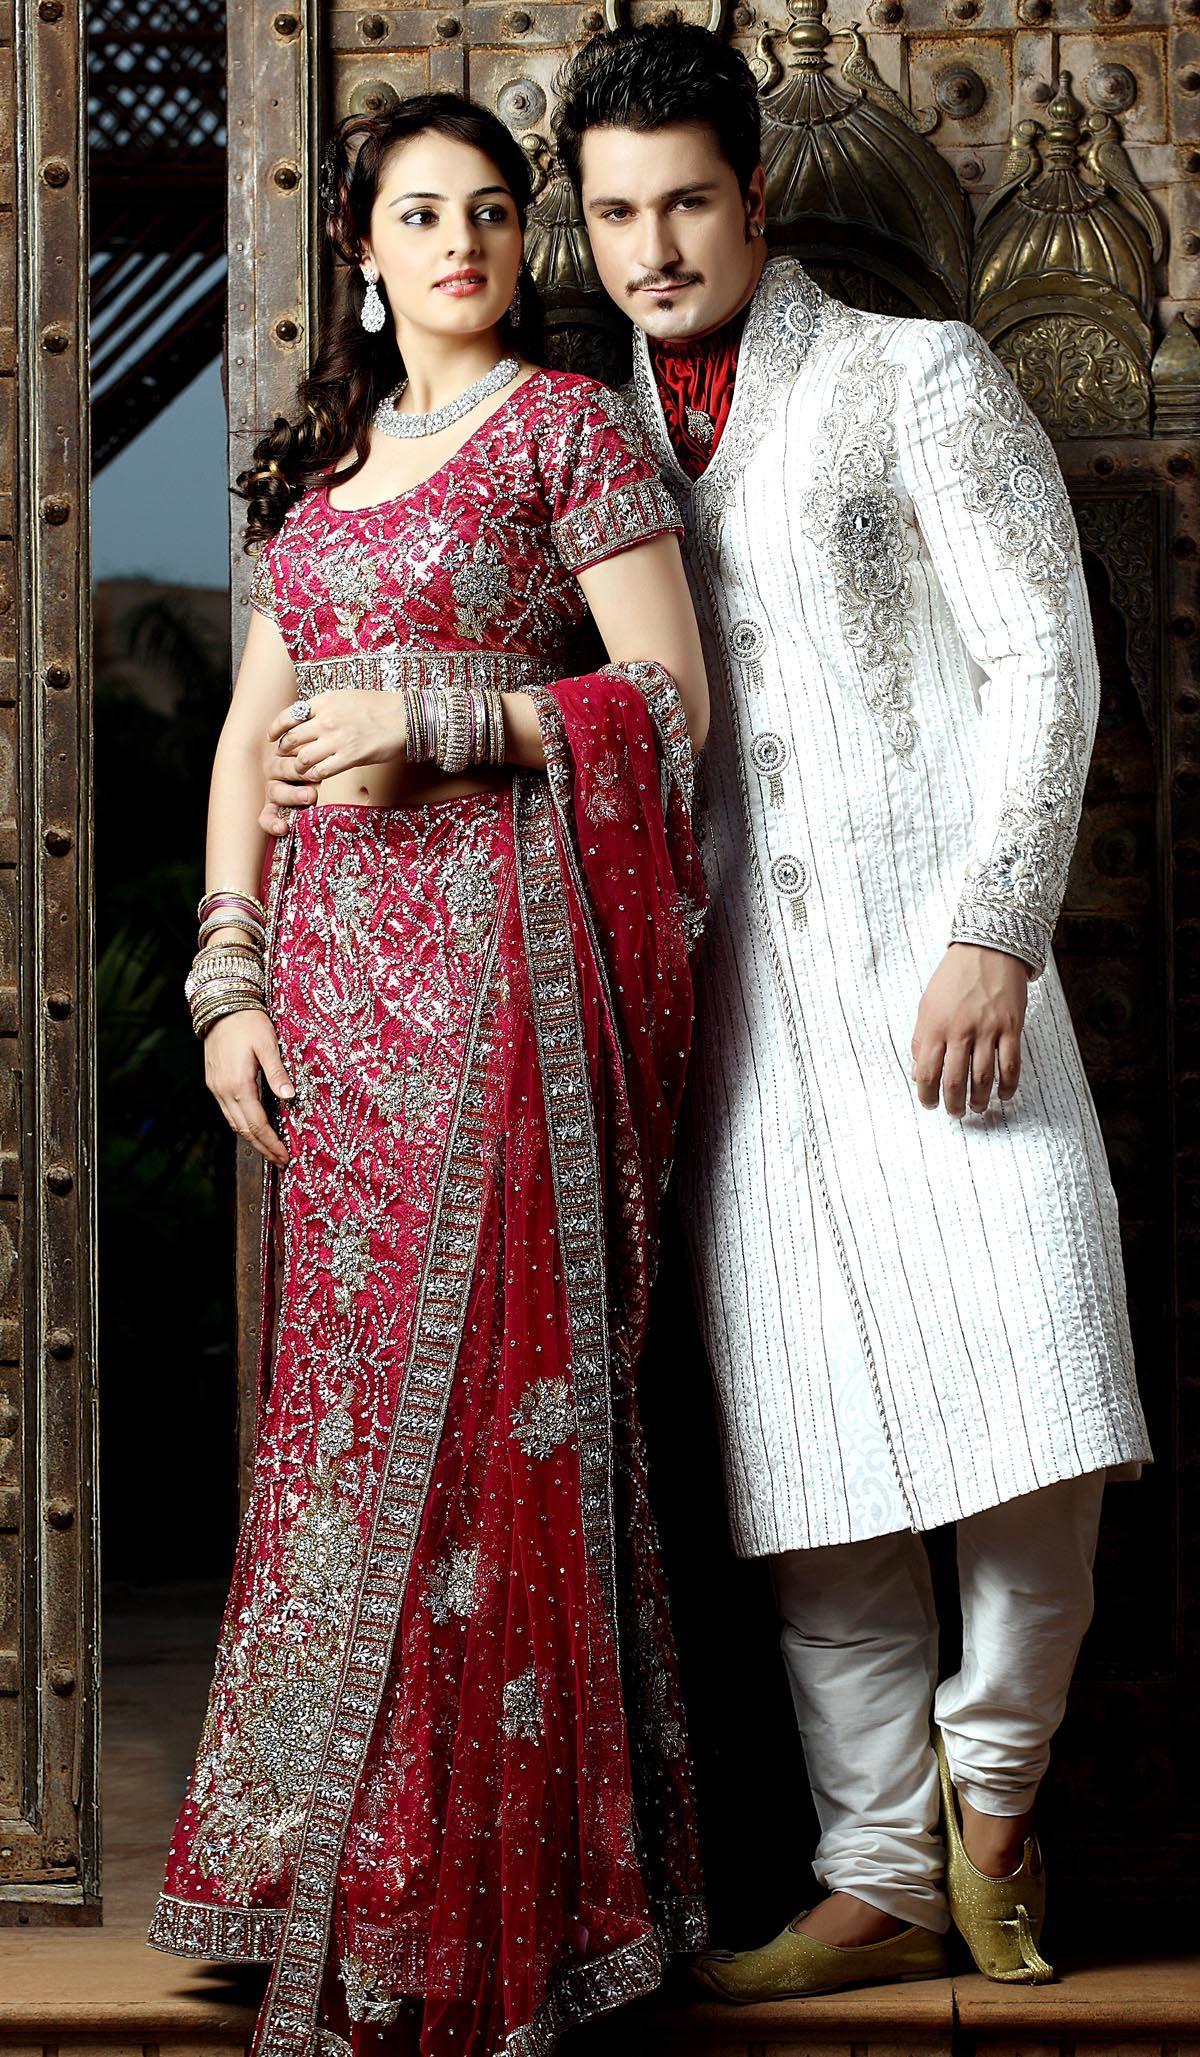 Dress Up Wedding S His Kurta And Her Lehenga Are So Pretty